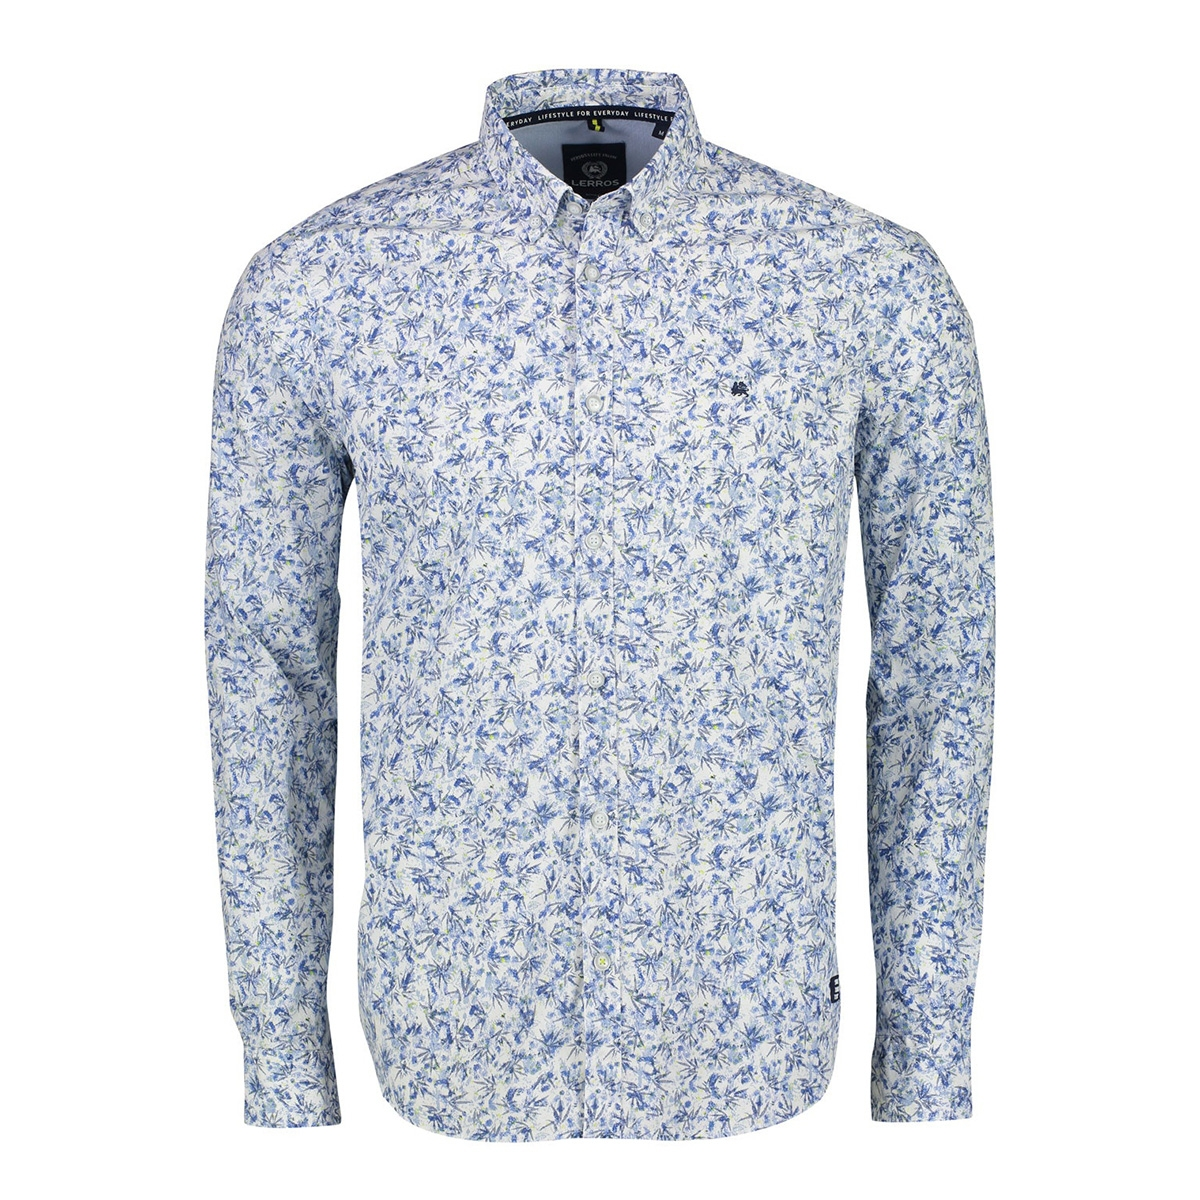 overhemd met print 2021133 lerros overhemd 440